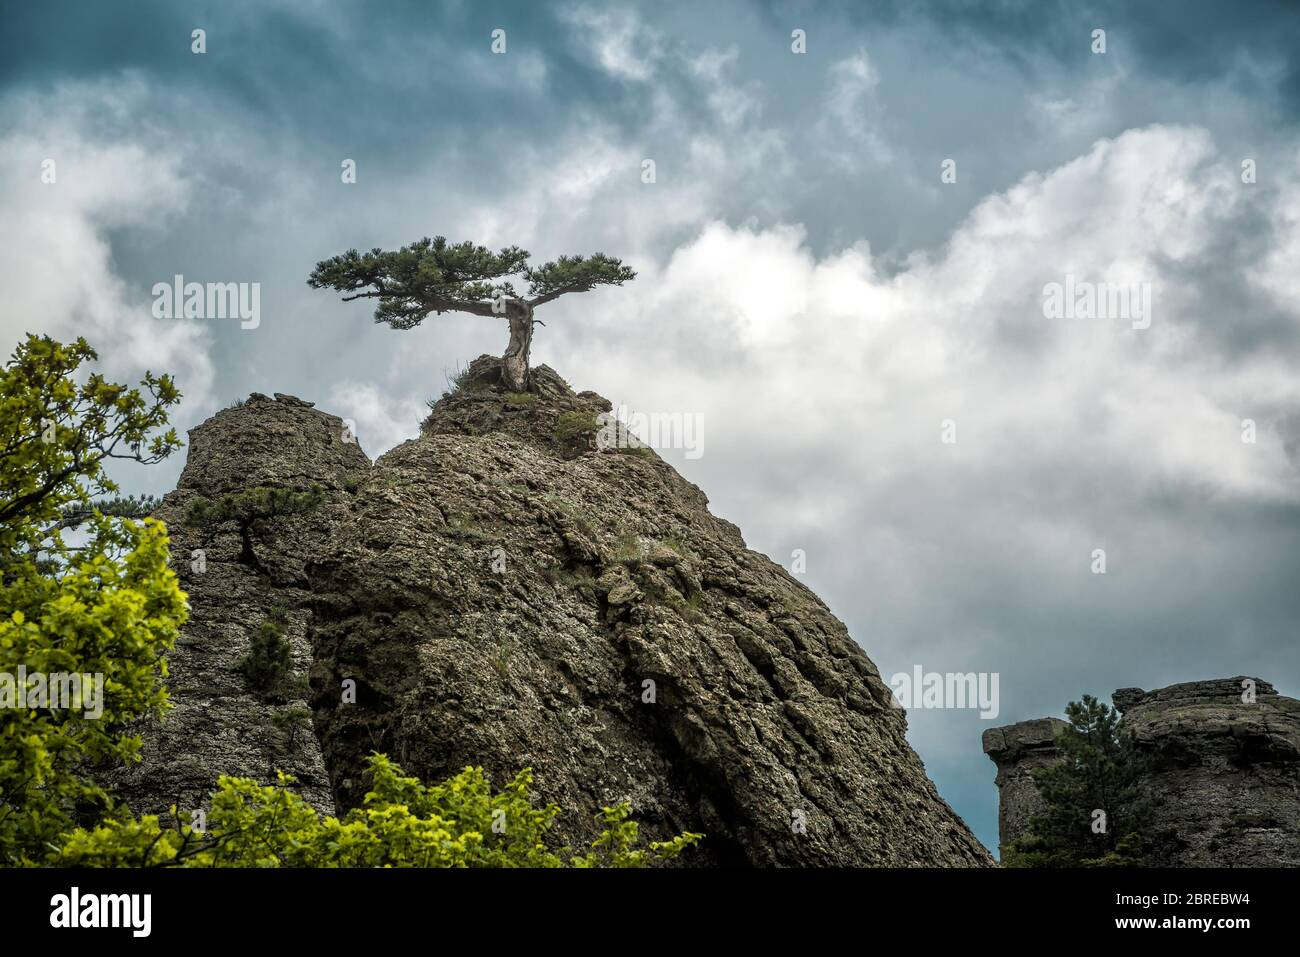 Lonely tree on a rock in the Demerdji mountain. Landscape of Crimea, Russia. Stock Photo